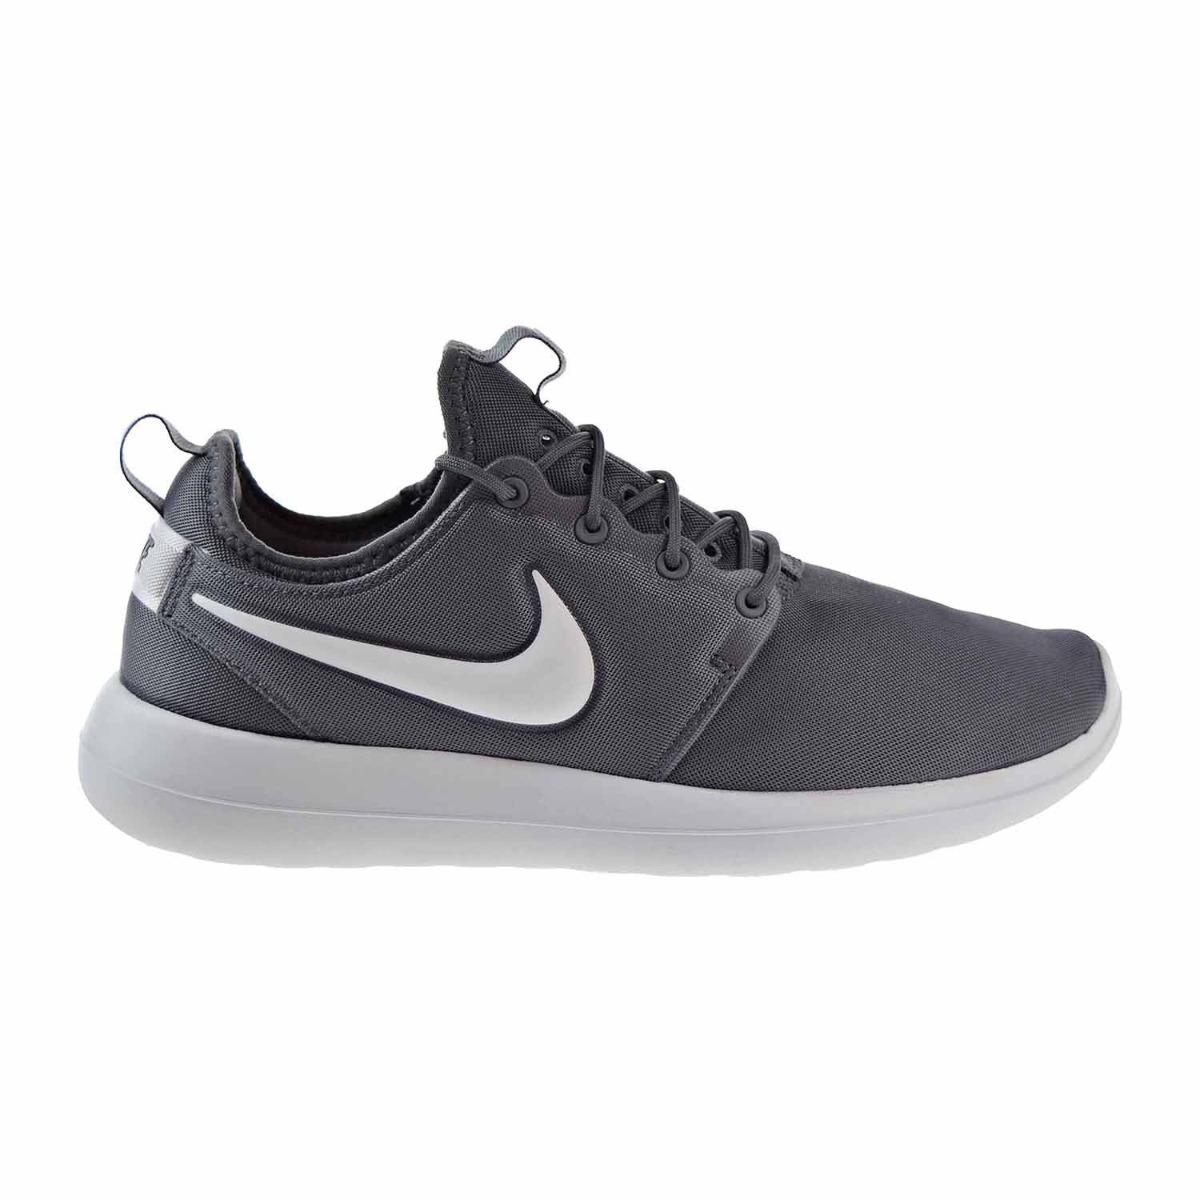 best loved 4fff5 f3899 ... new style zapatillas nike roshe two dark grey hombre bf334 612c4 ...